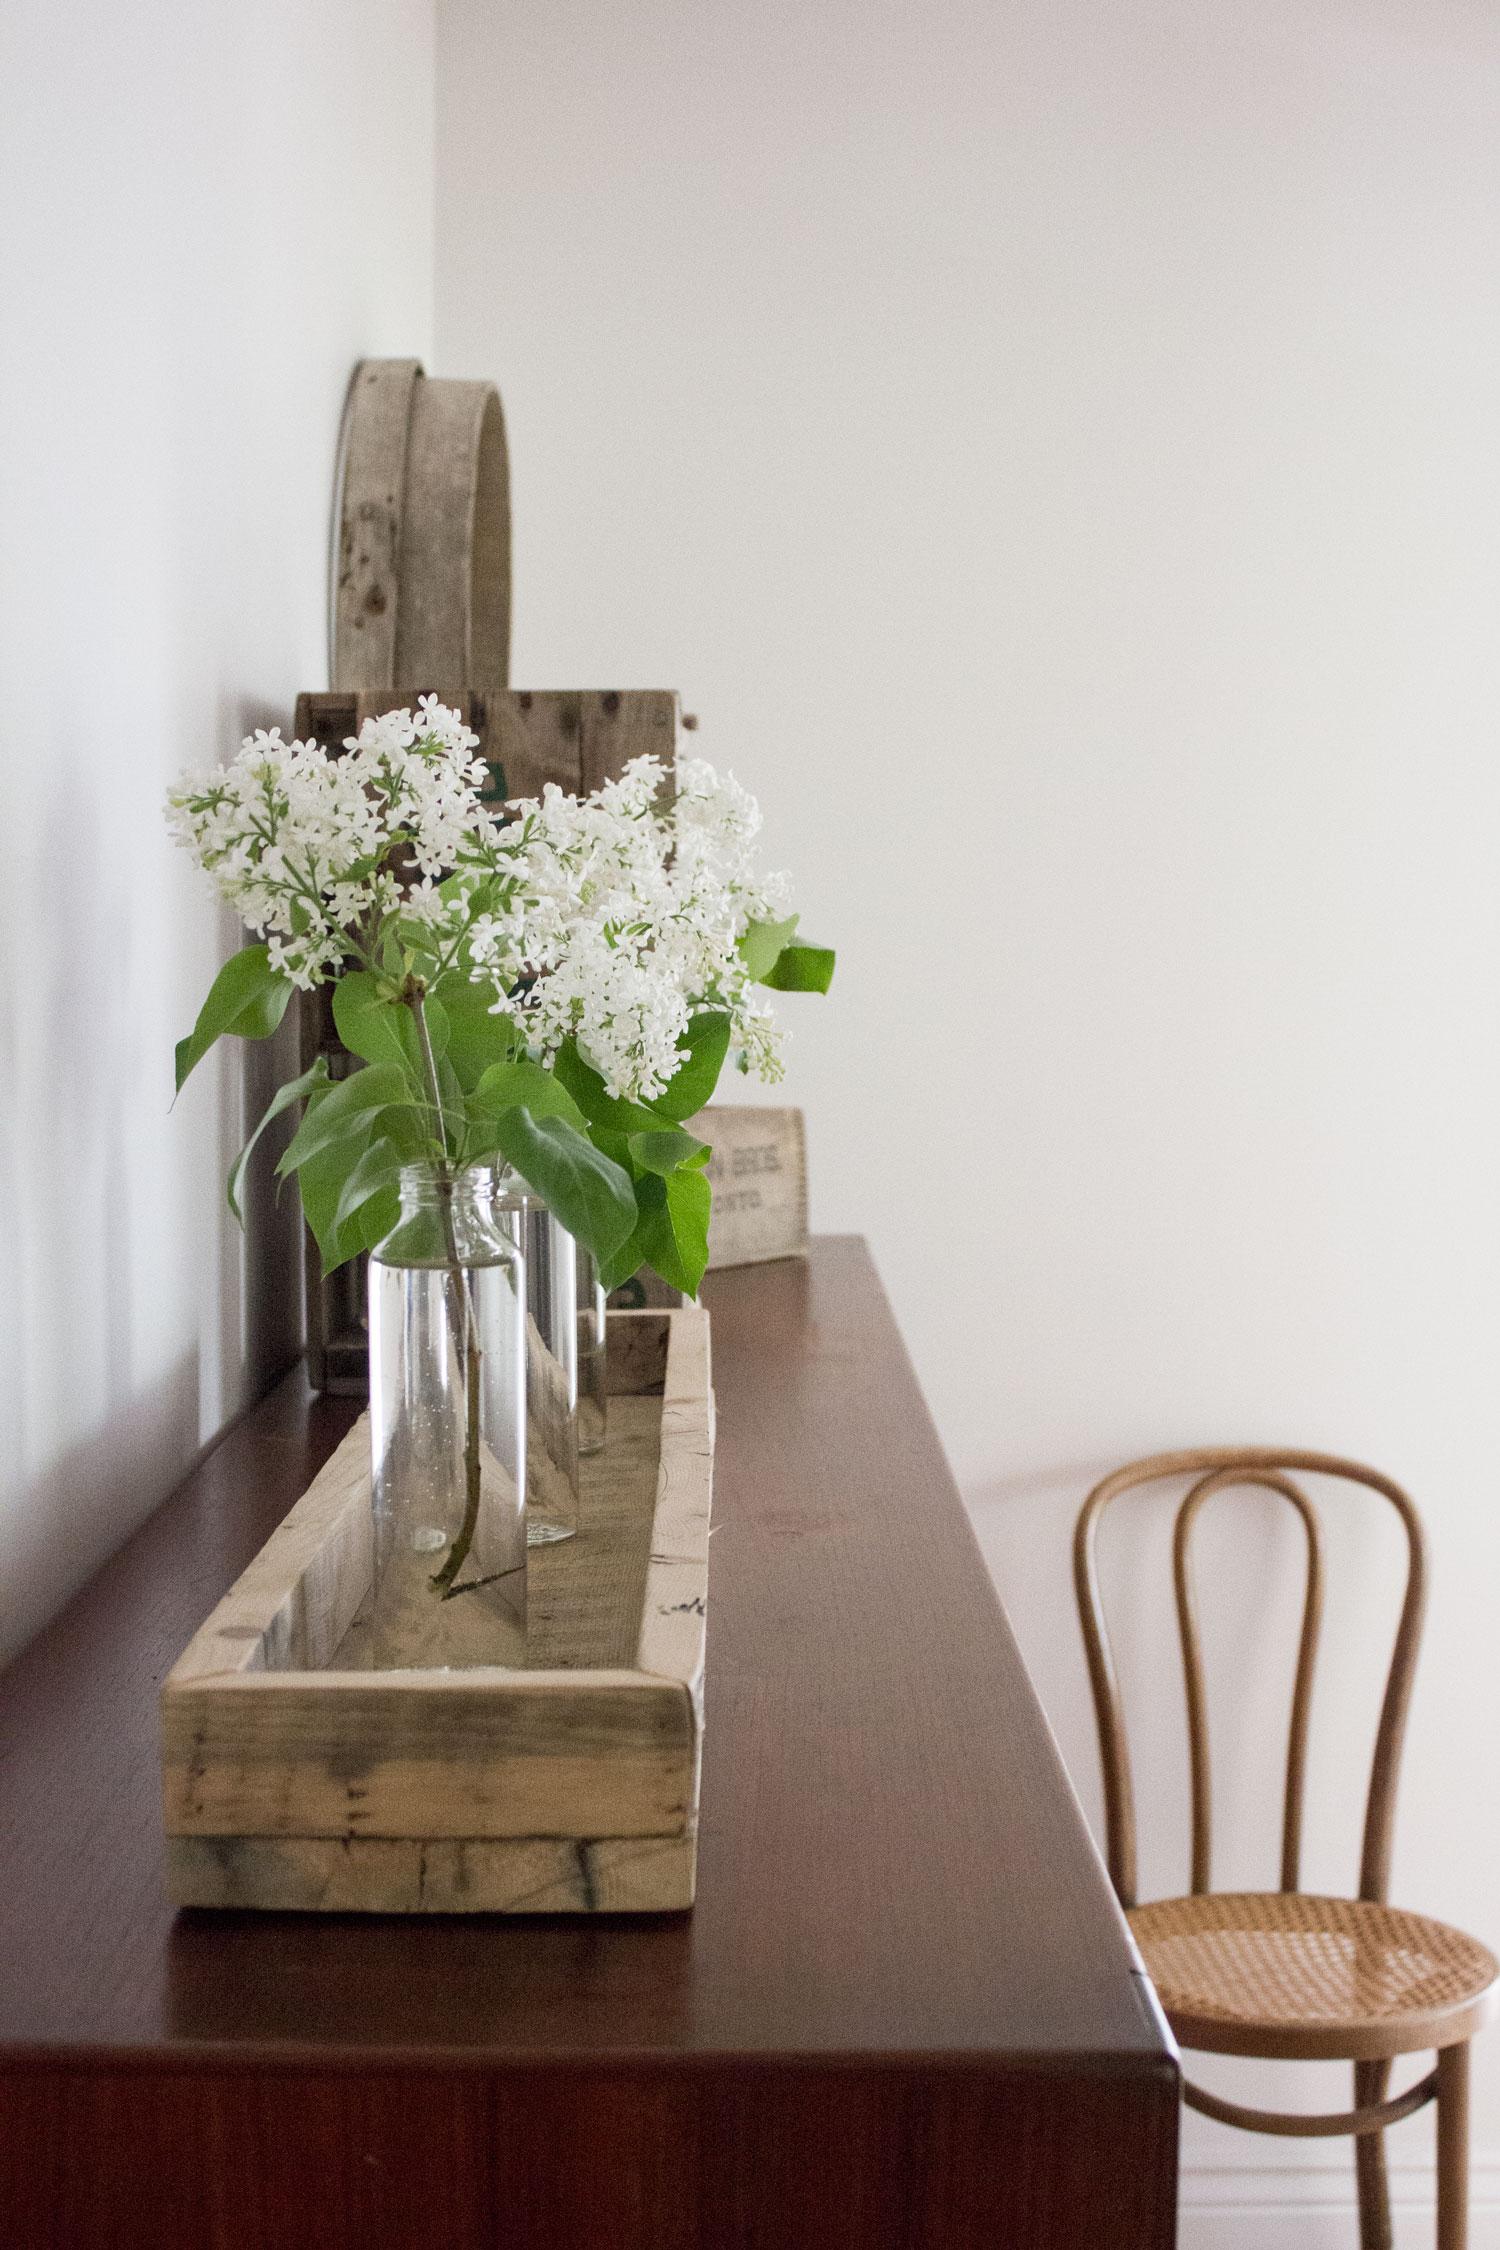 hallway-credenza-and-cane-chair.jpg